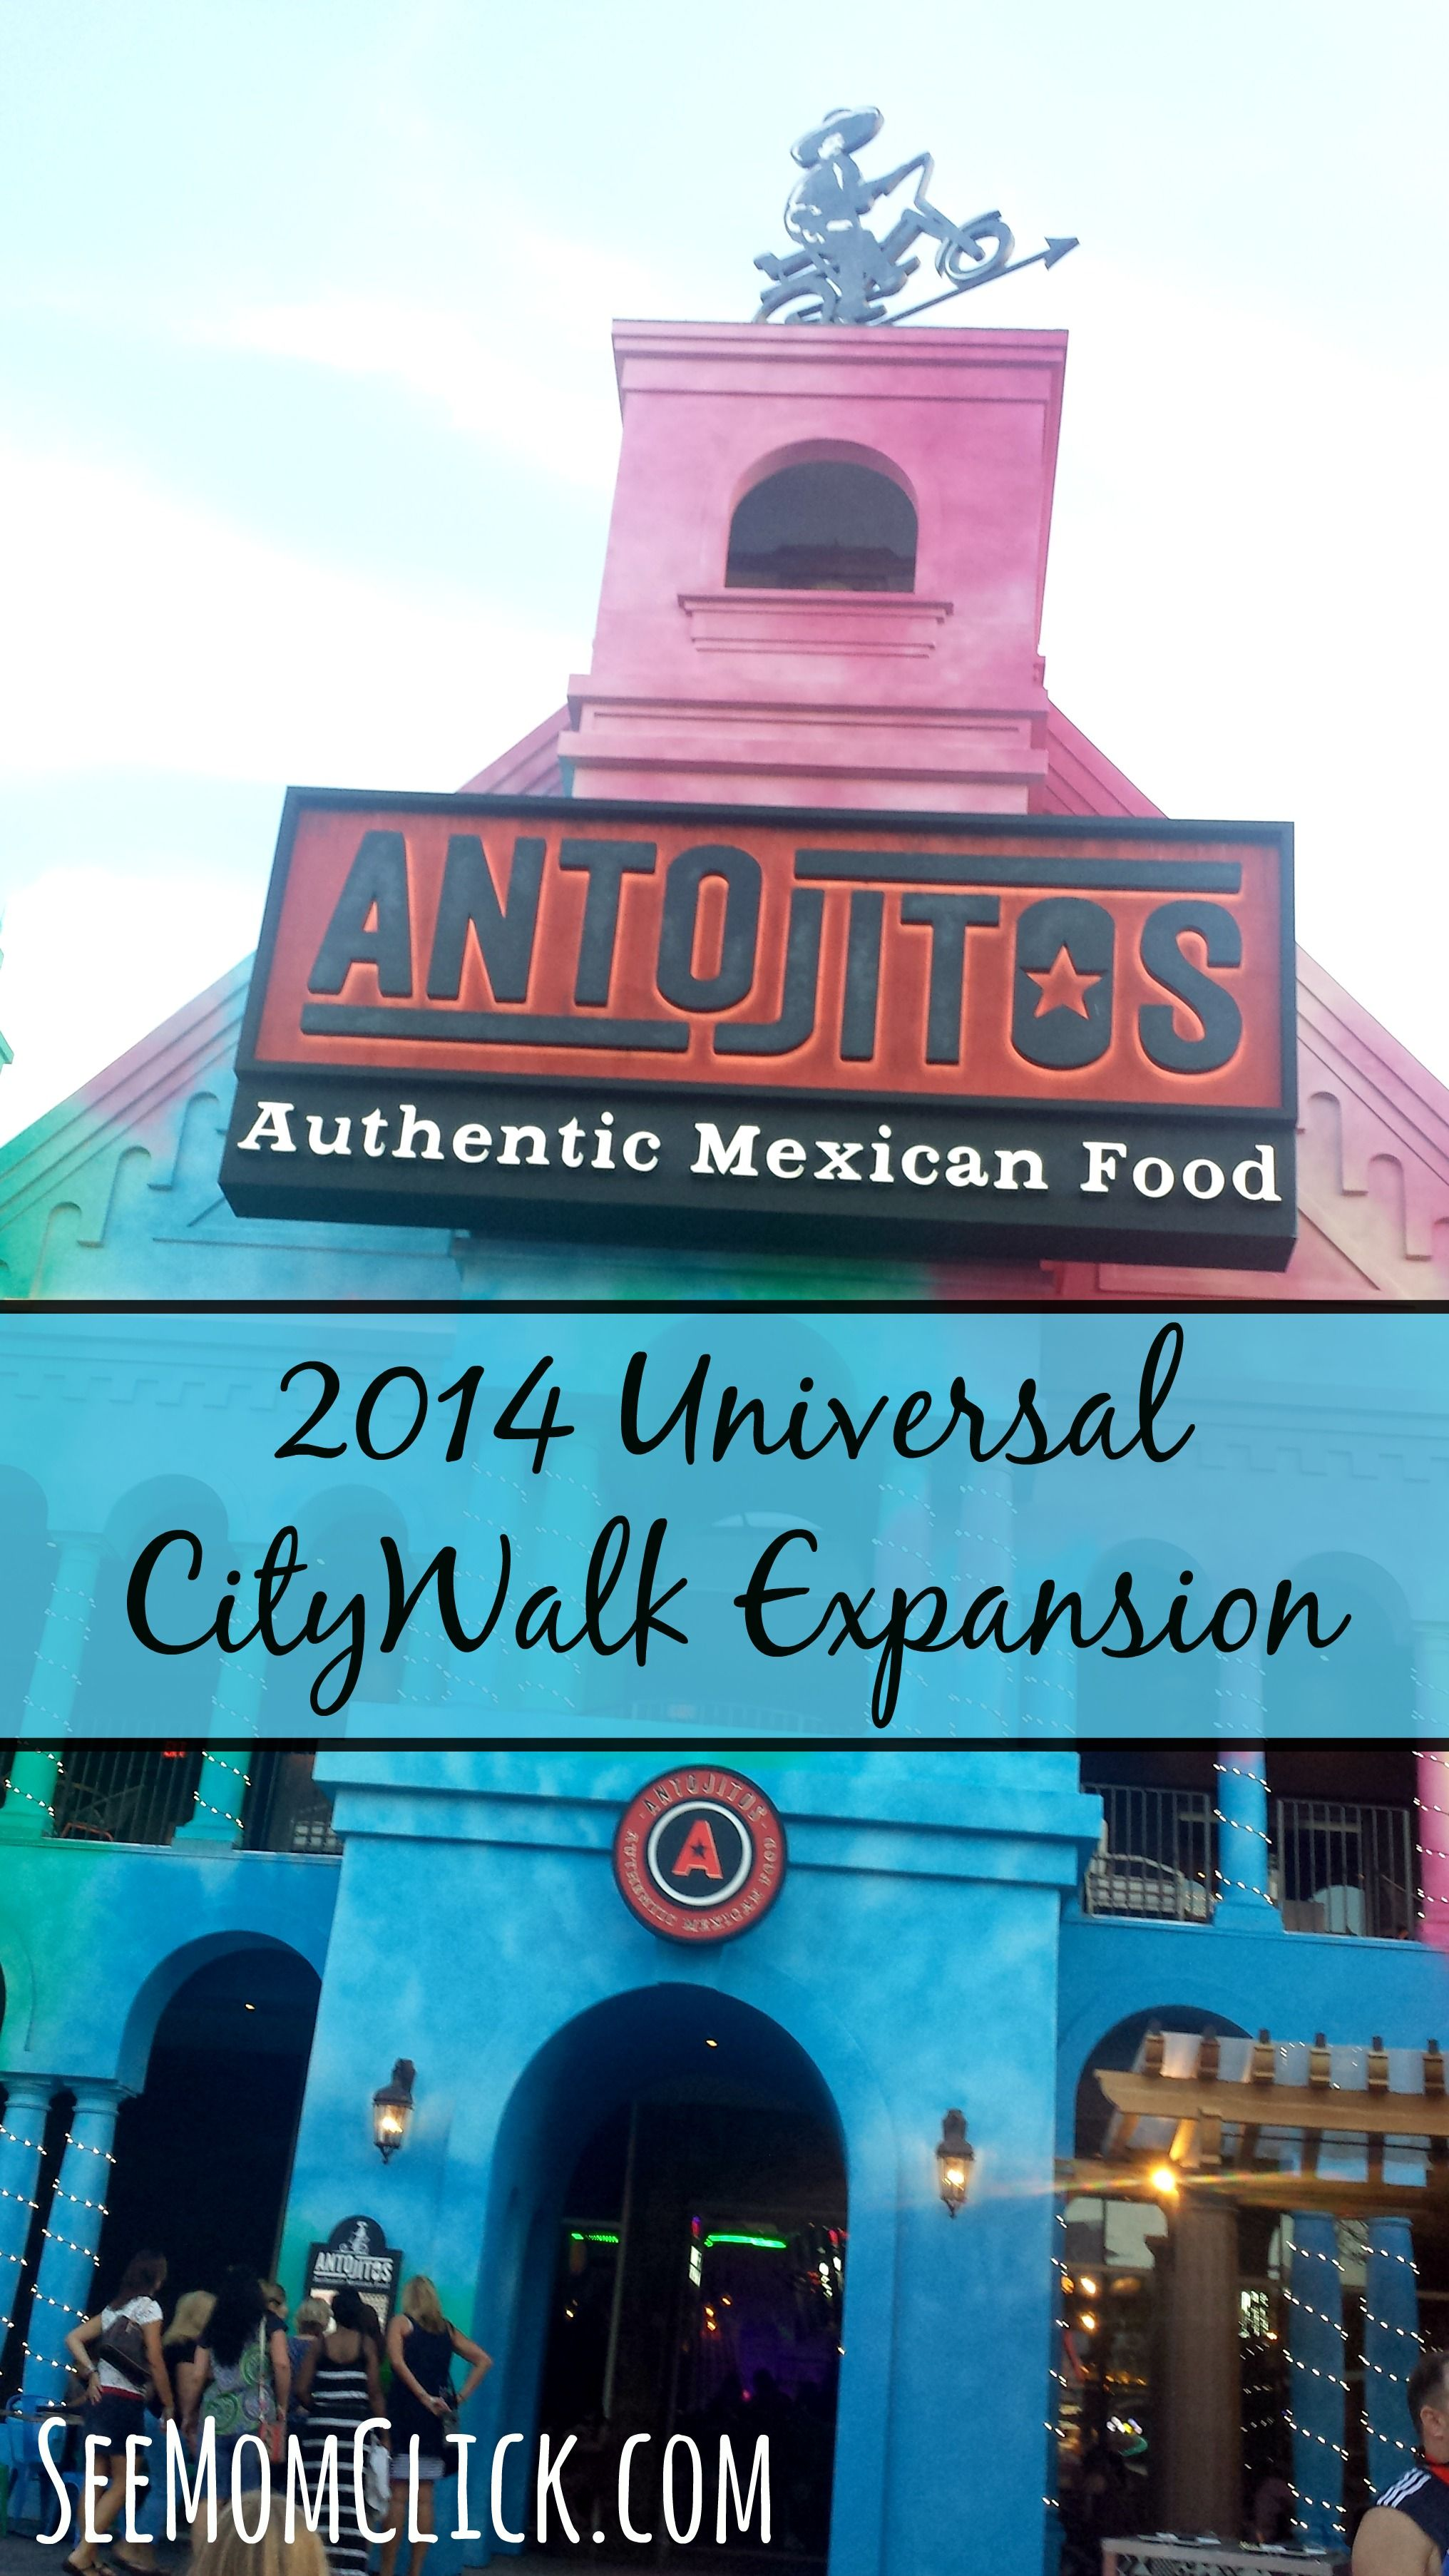 Antojitos universal citywalk expansion see mom click